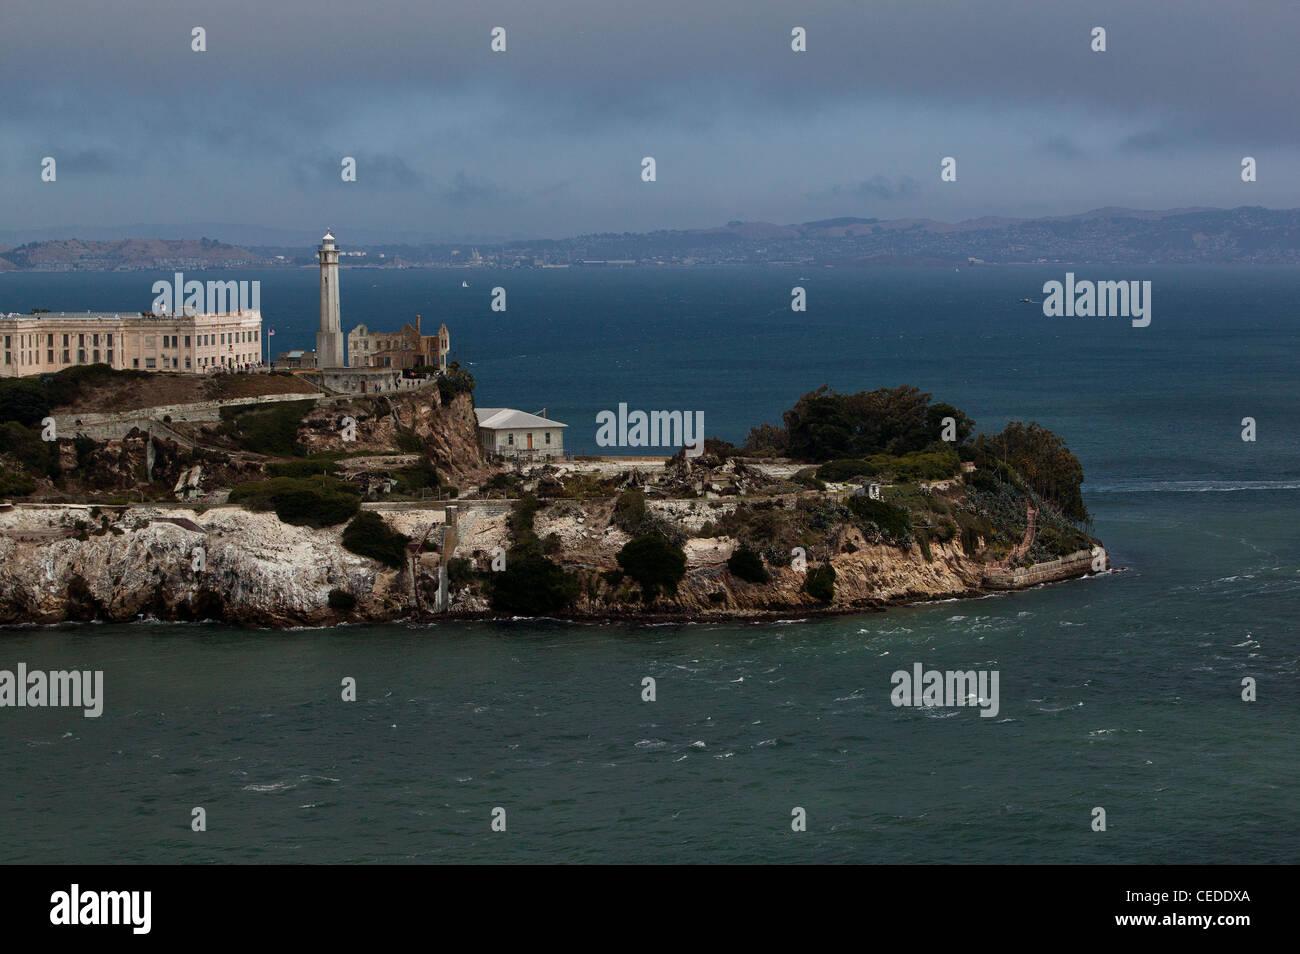 aerial photograph Alcatraz island San Francisco - Stock Image